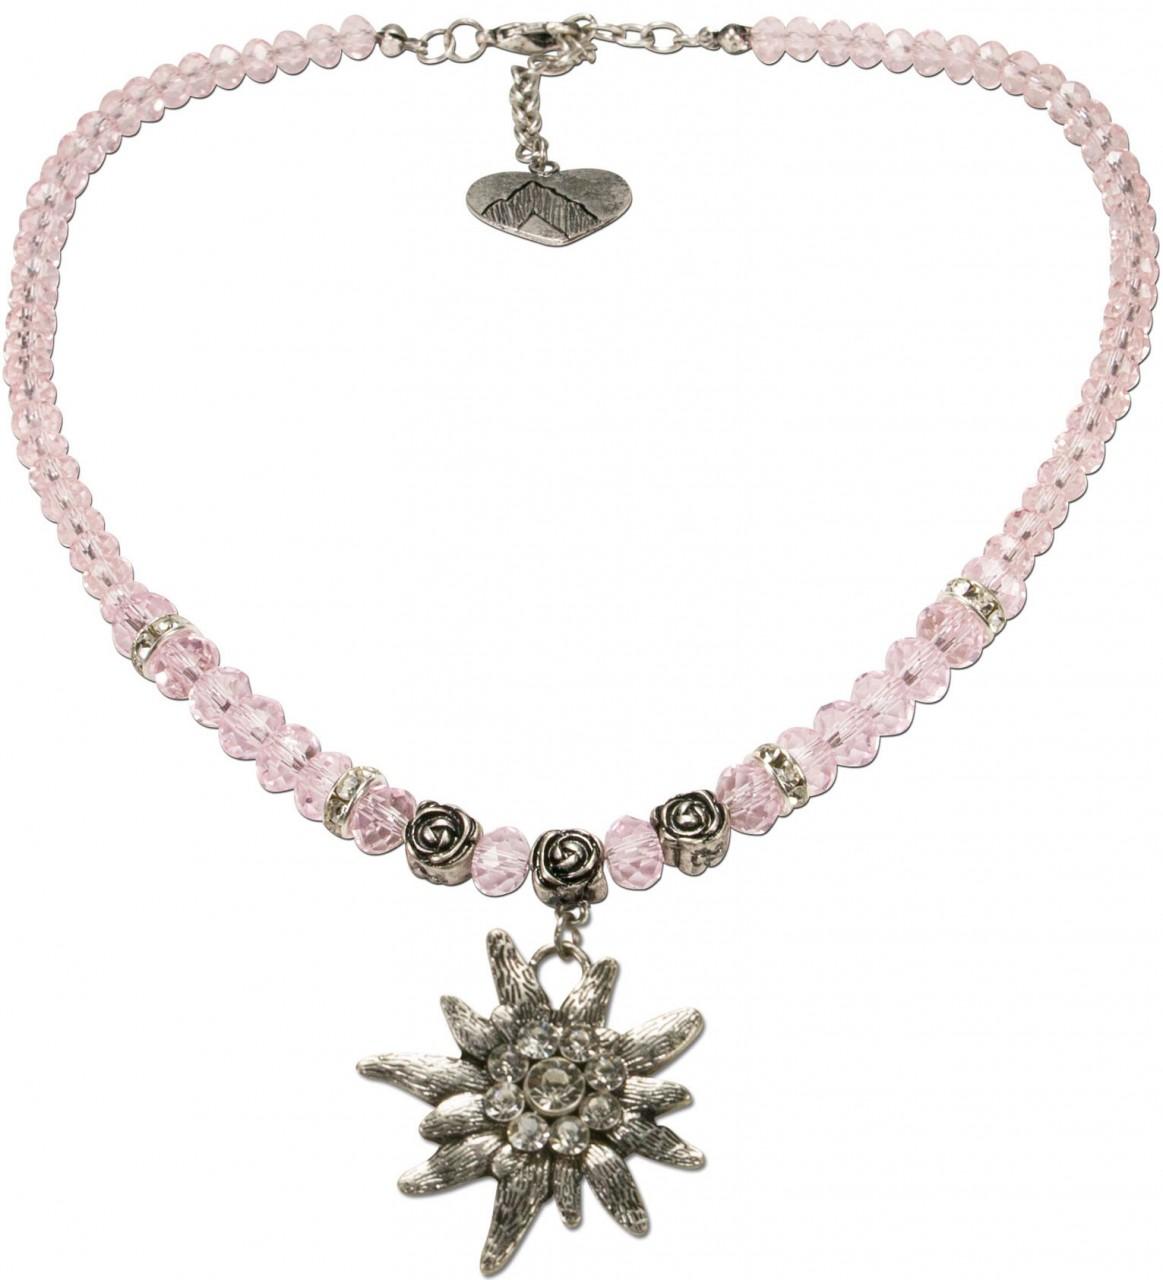 Trachtenkette großes Edelweiß rosa